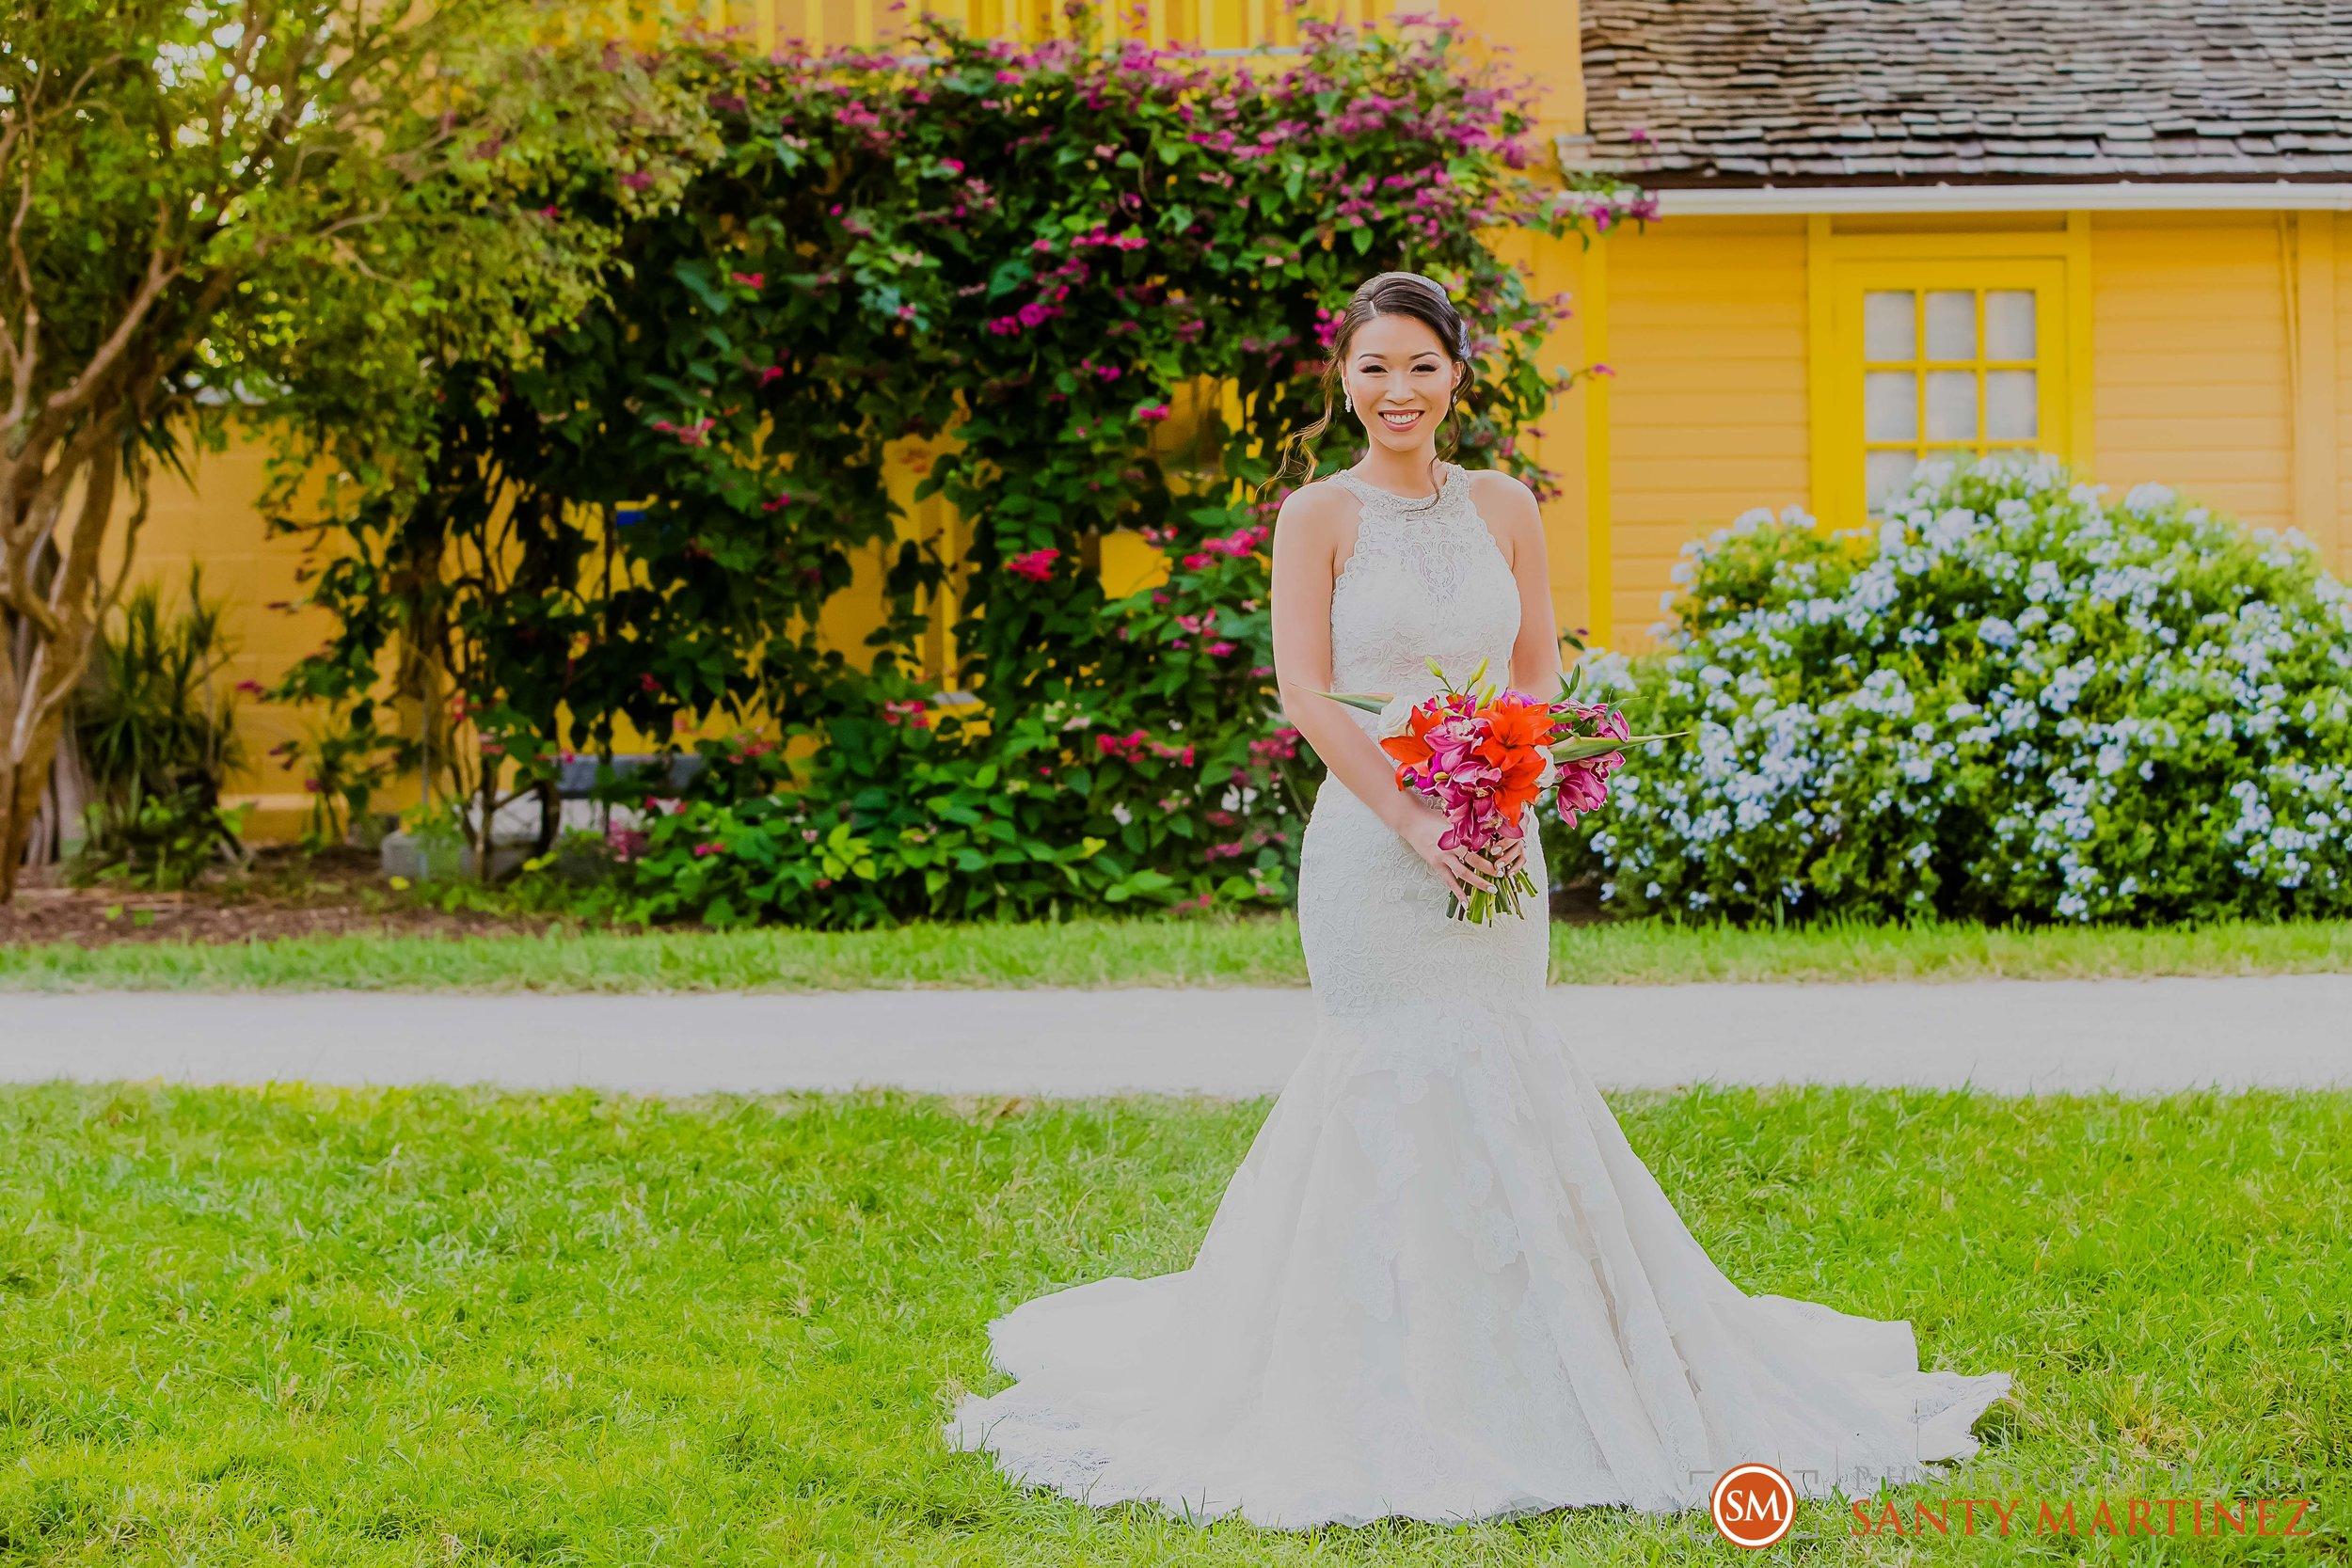 Wedding Bonnet House - Photography by Santy Martinez-17.jpg